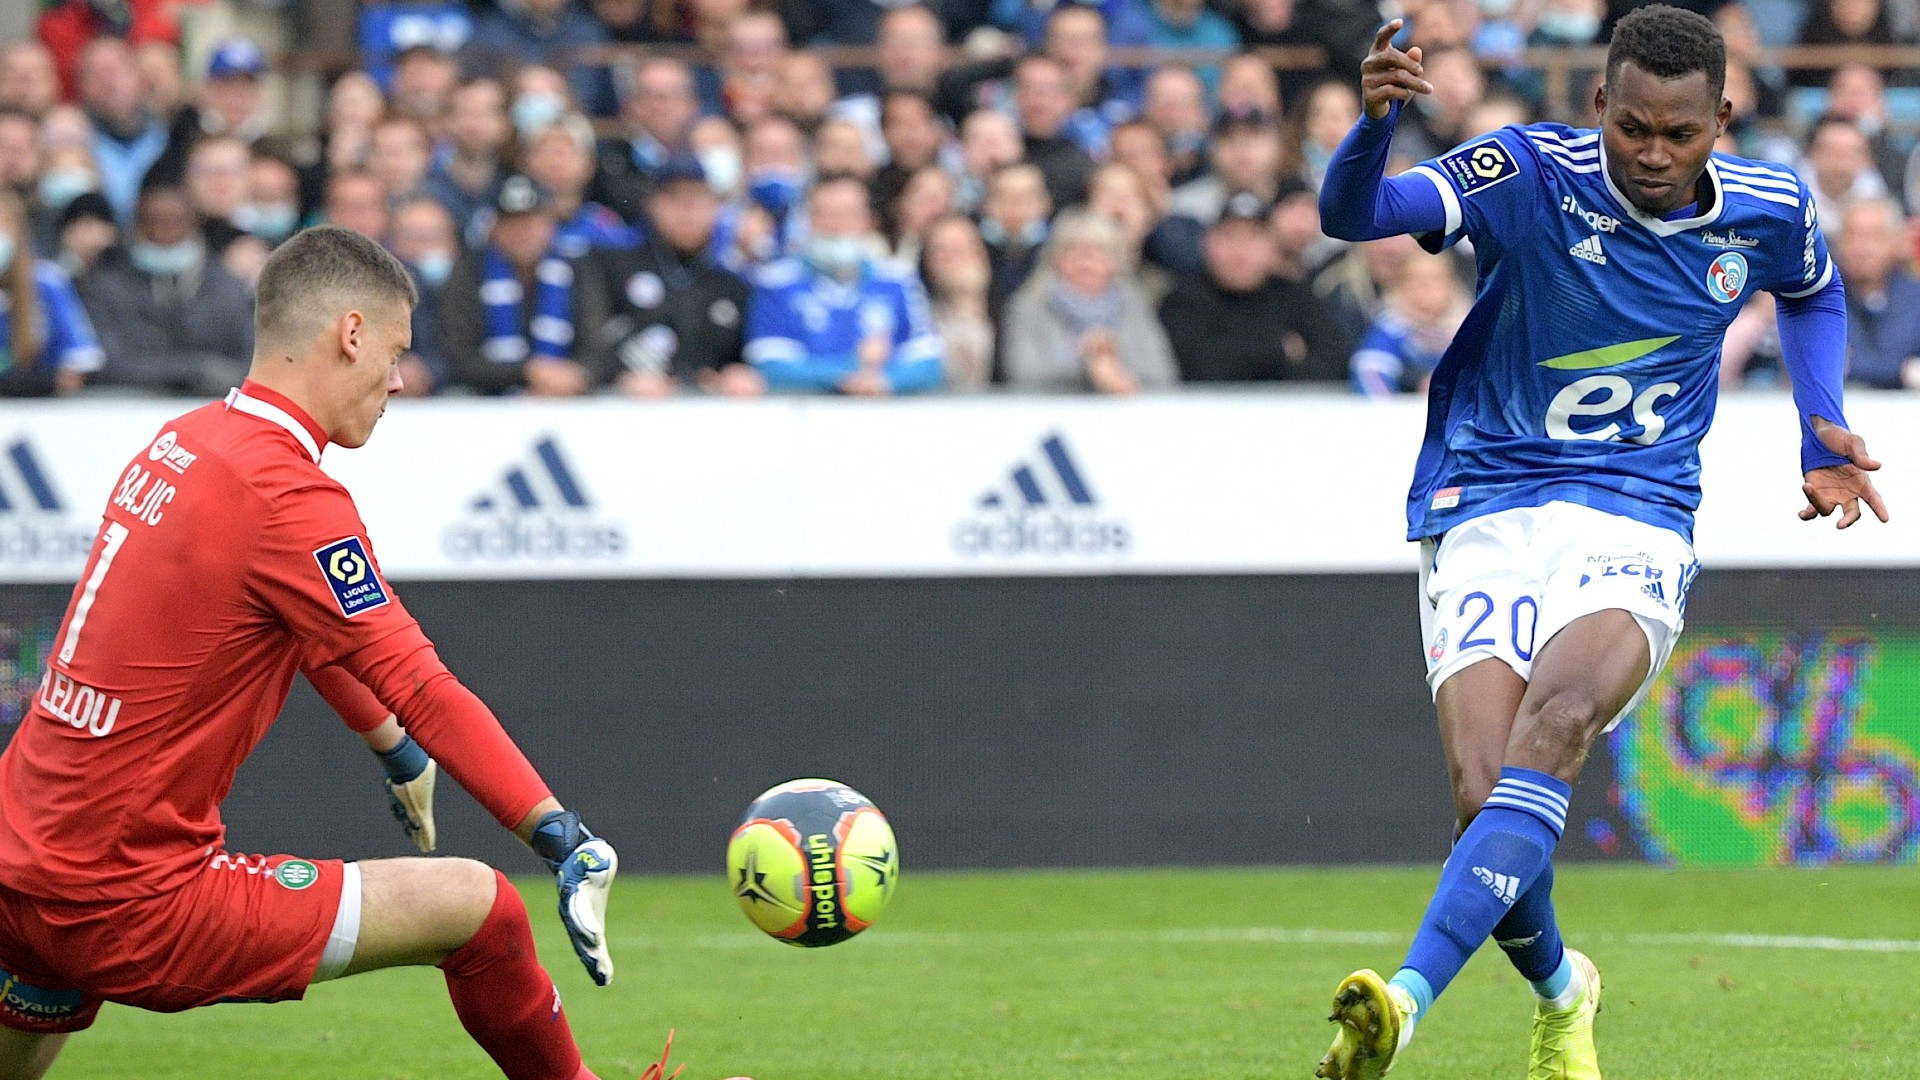 Ligue 1 Wrap: Sulemana, Khazri & Balde score, Youssouf sees red